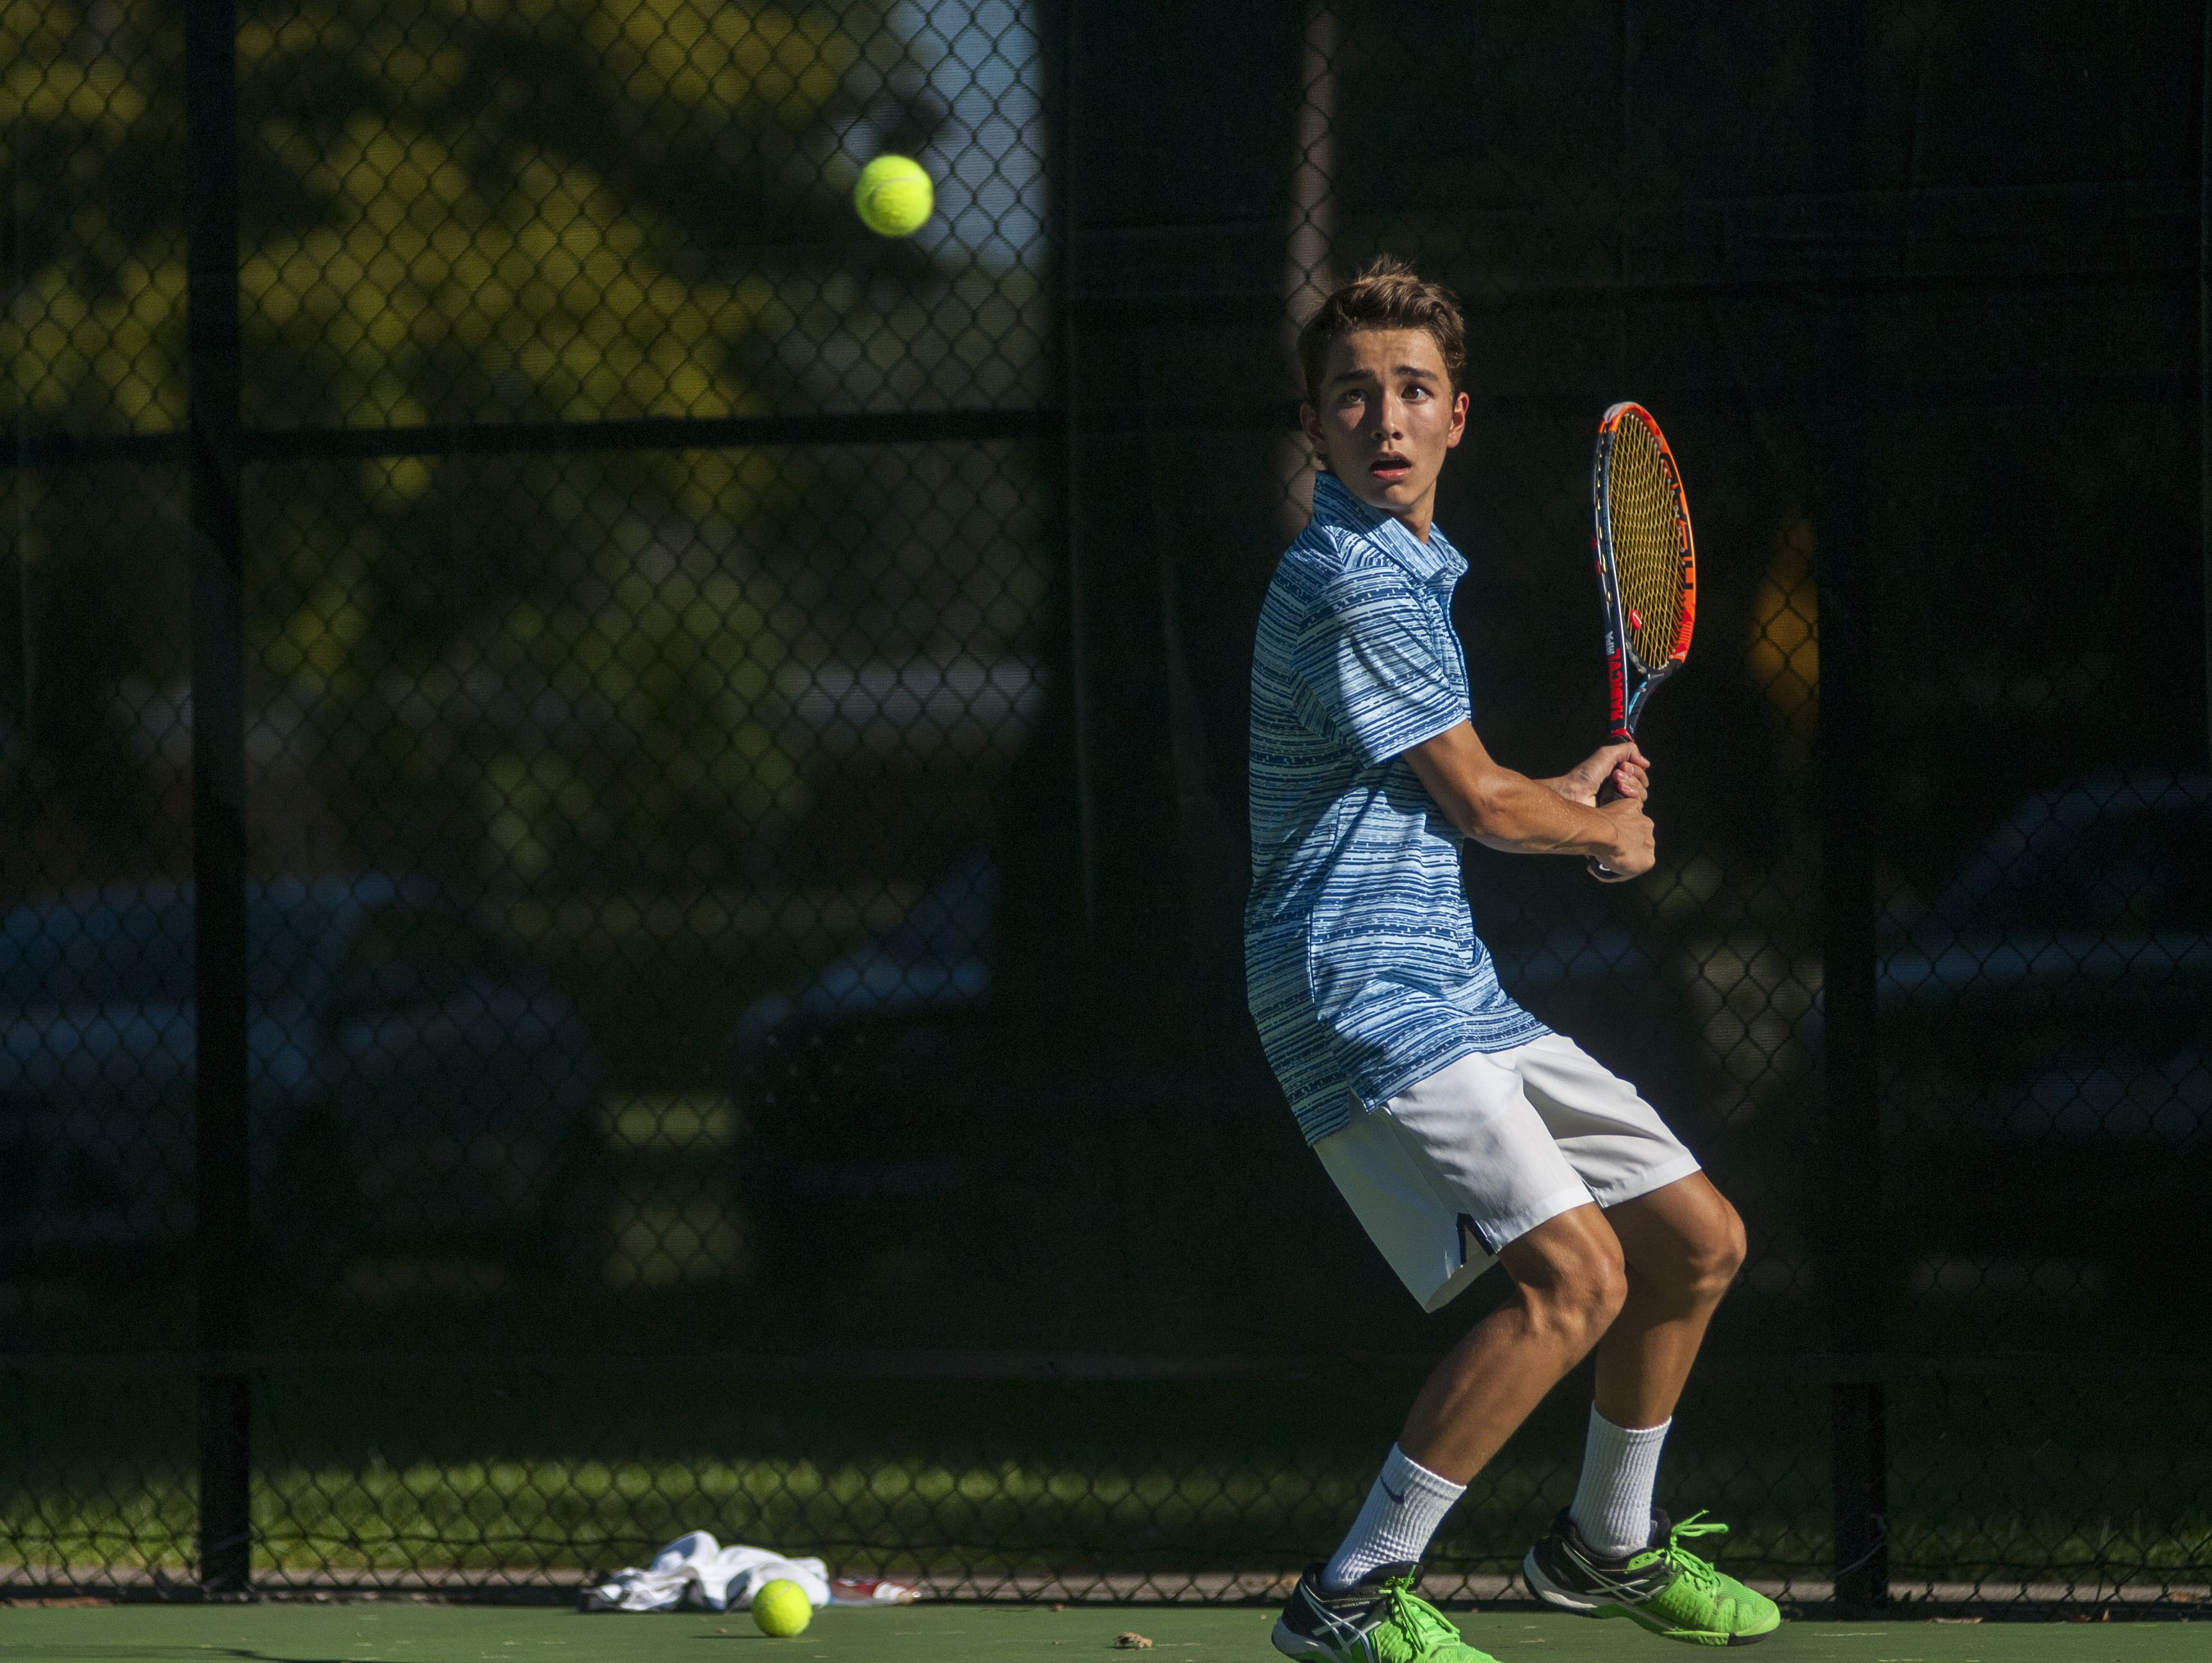 Saints' John Mason readies to return a serve Monday, Sept. 12, during boys tennis action at Sanborn Park tennis courts.